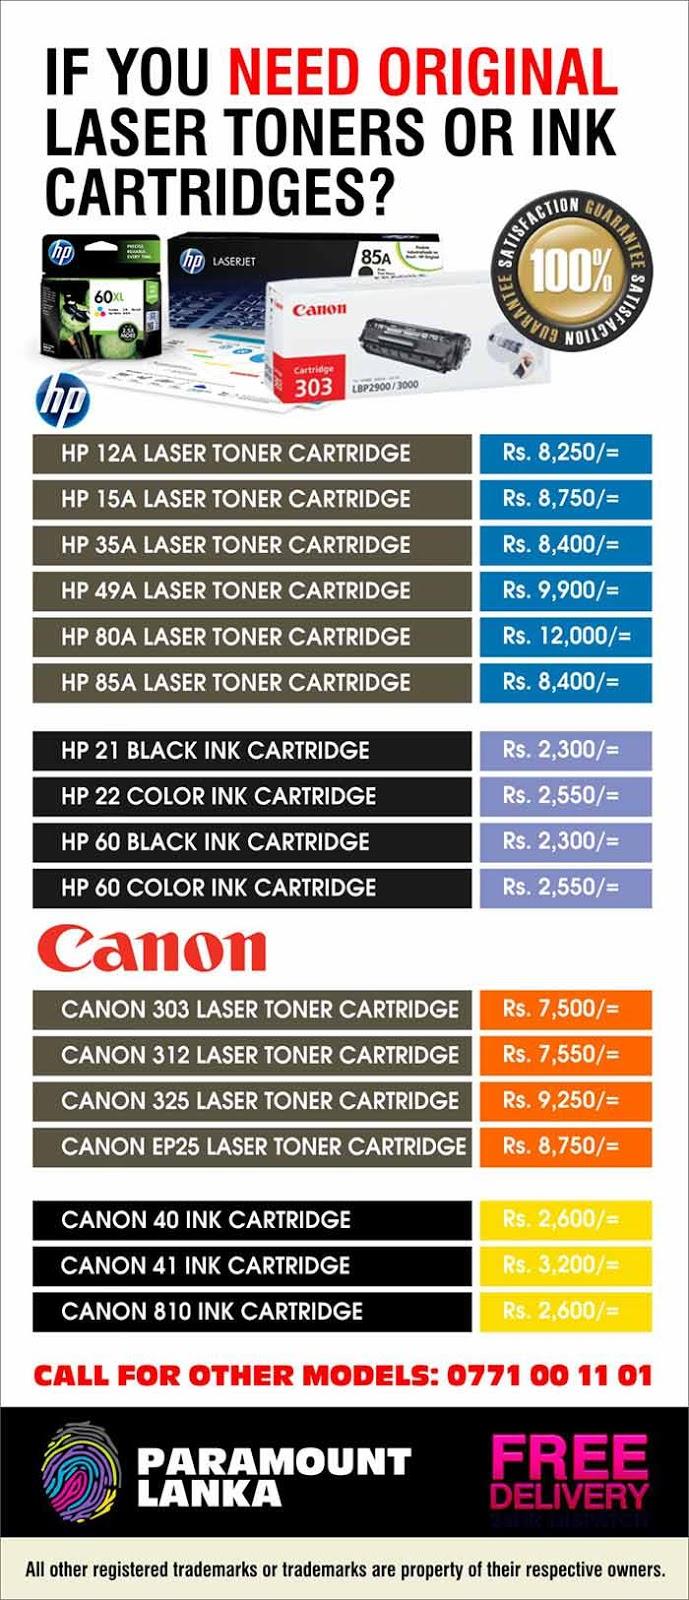 Hp Canon Samsung Dell Original Laser Toner Cartridges